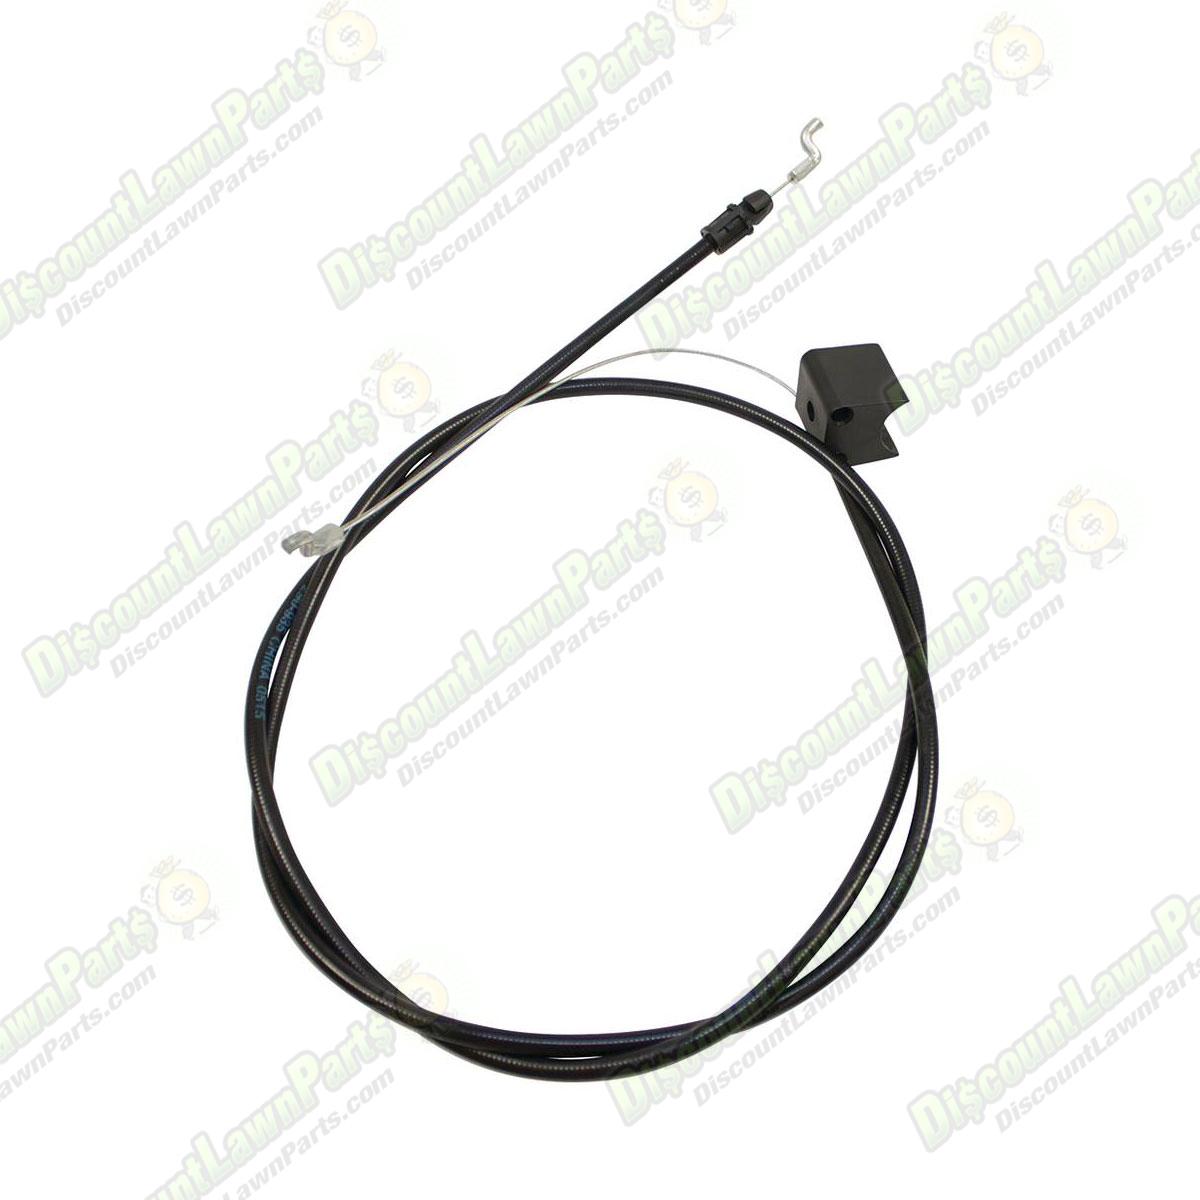 Brake Cable Toro 104